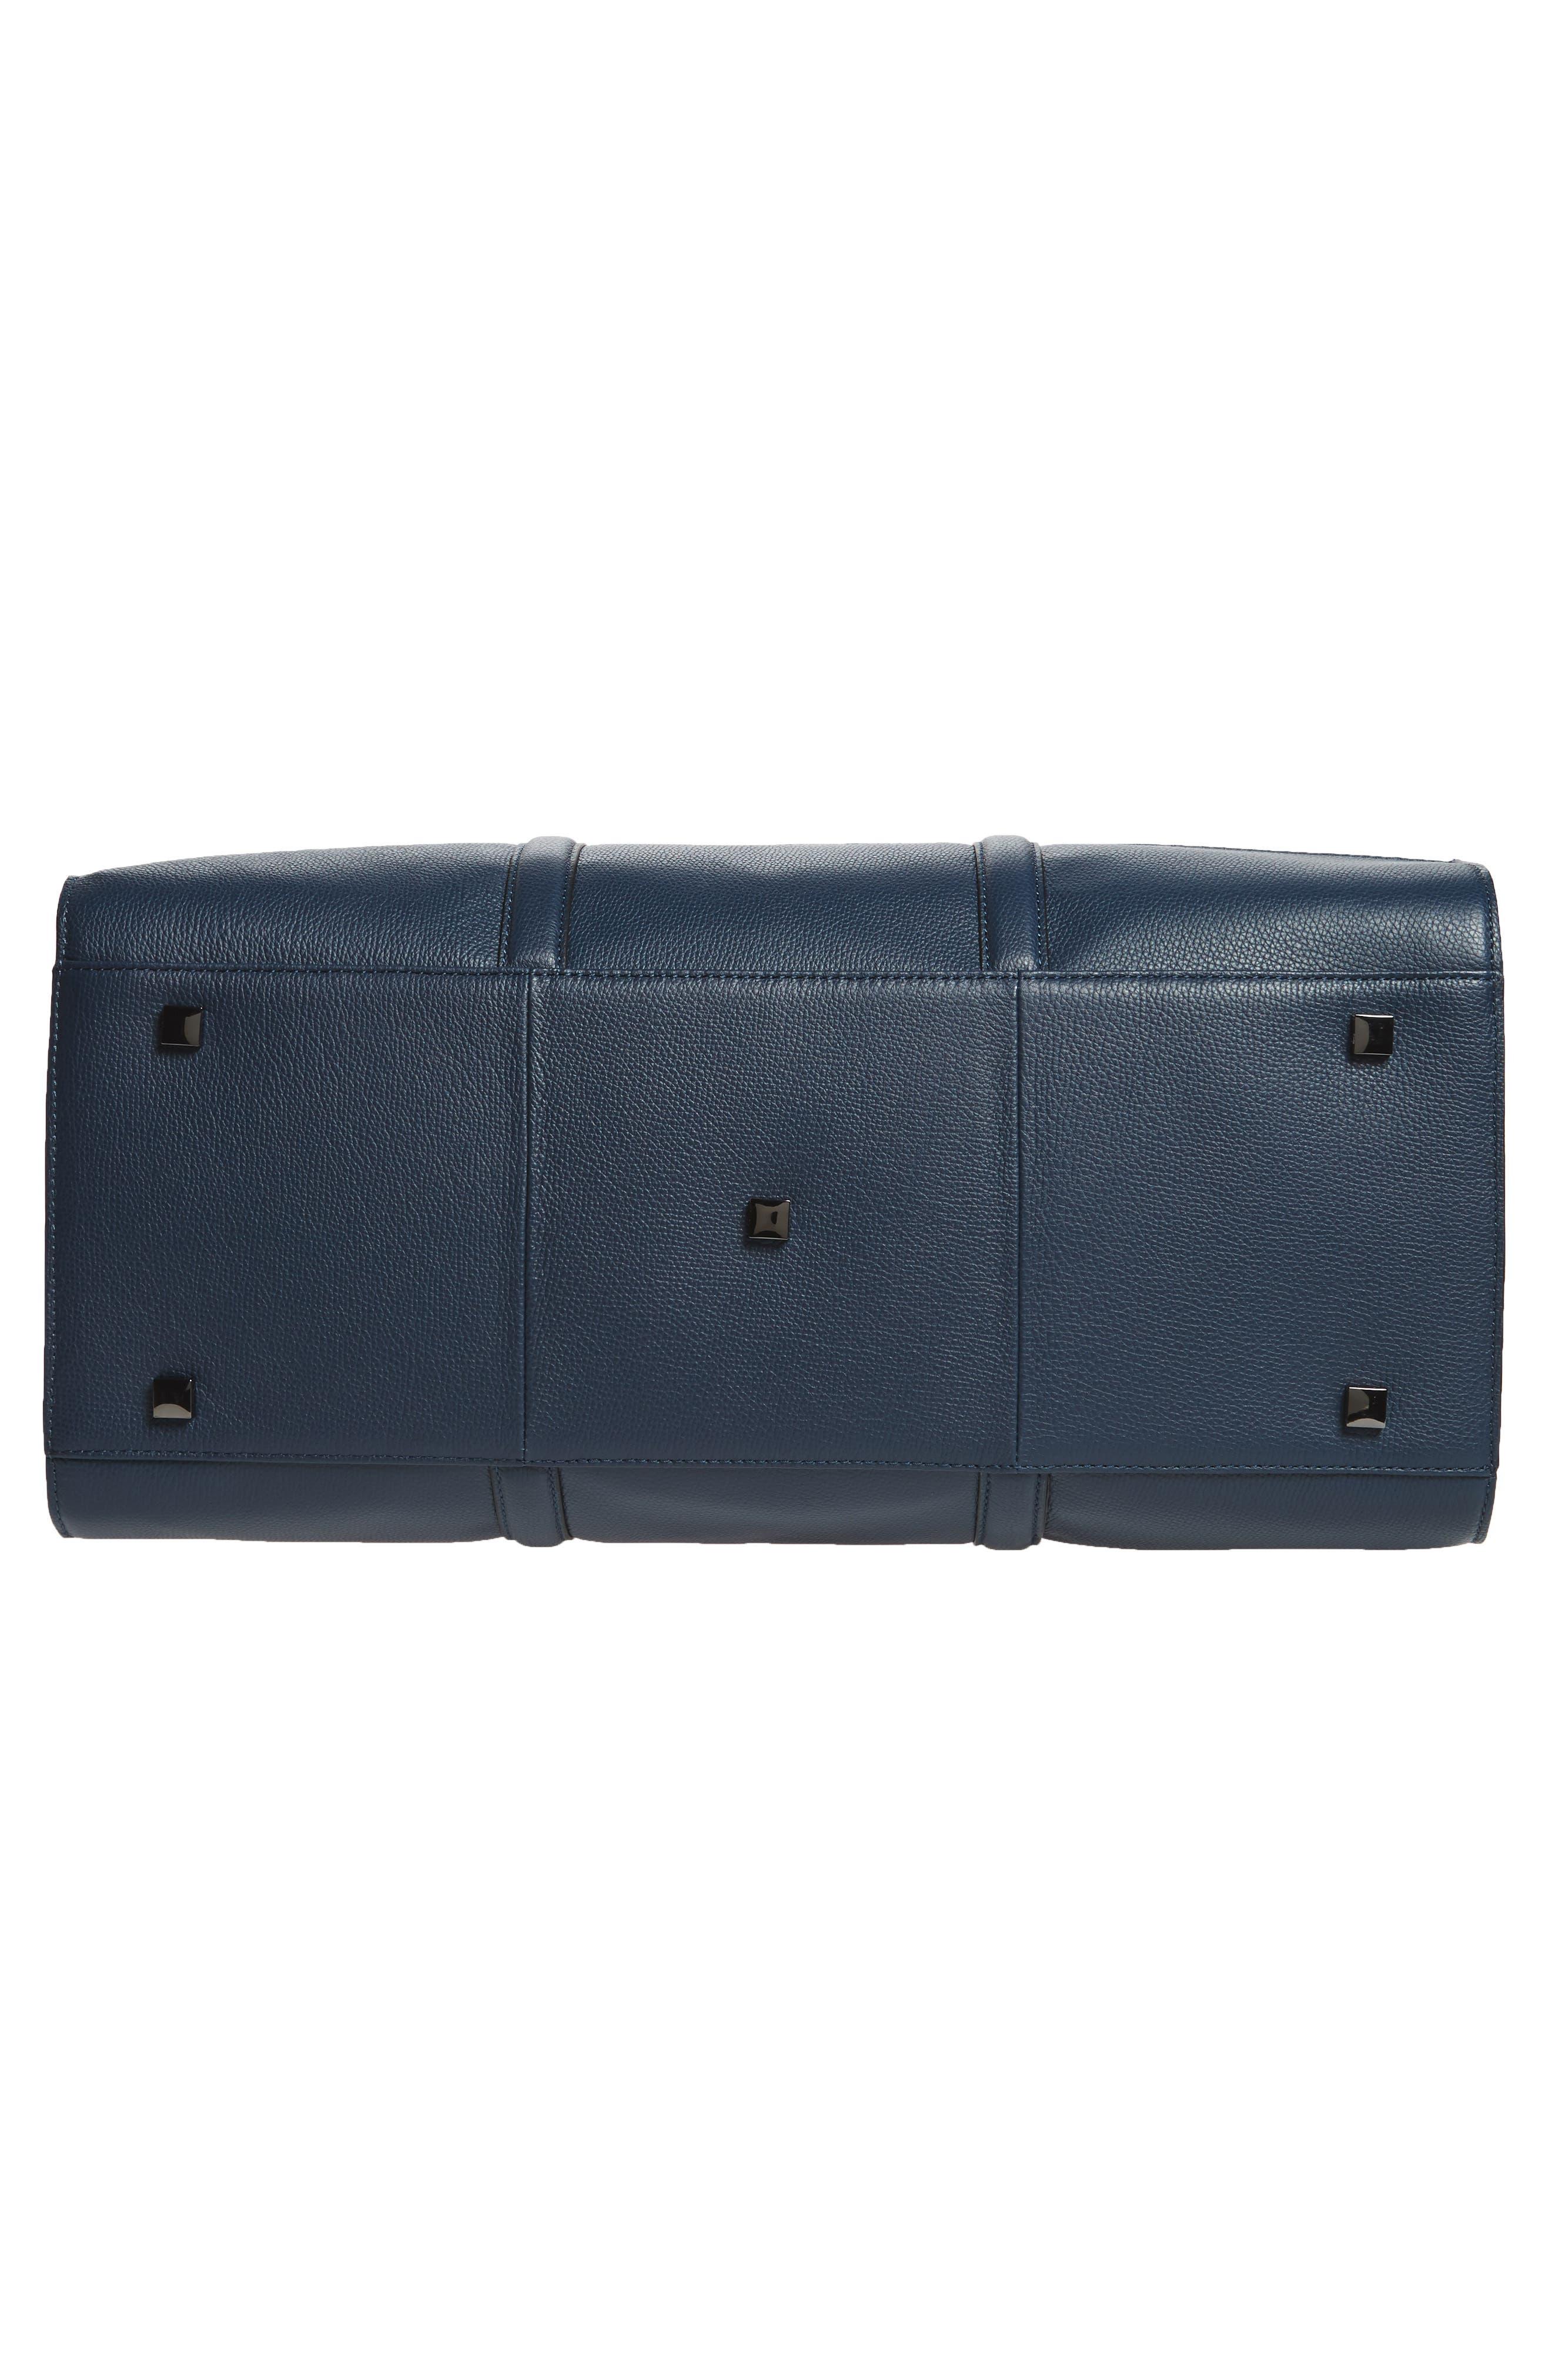 Leather Duffel Bag,                             Alternate thumbnail 17, color,